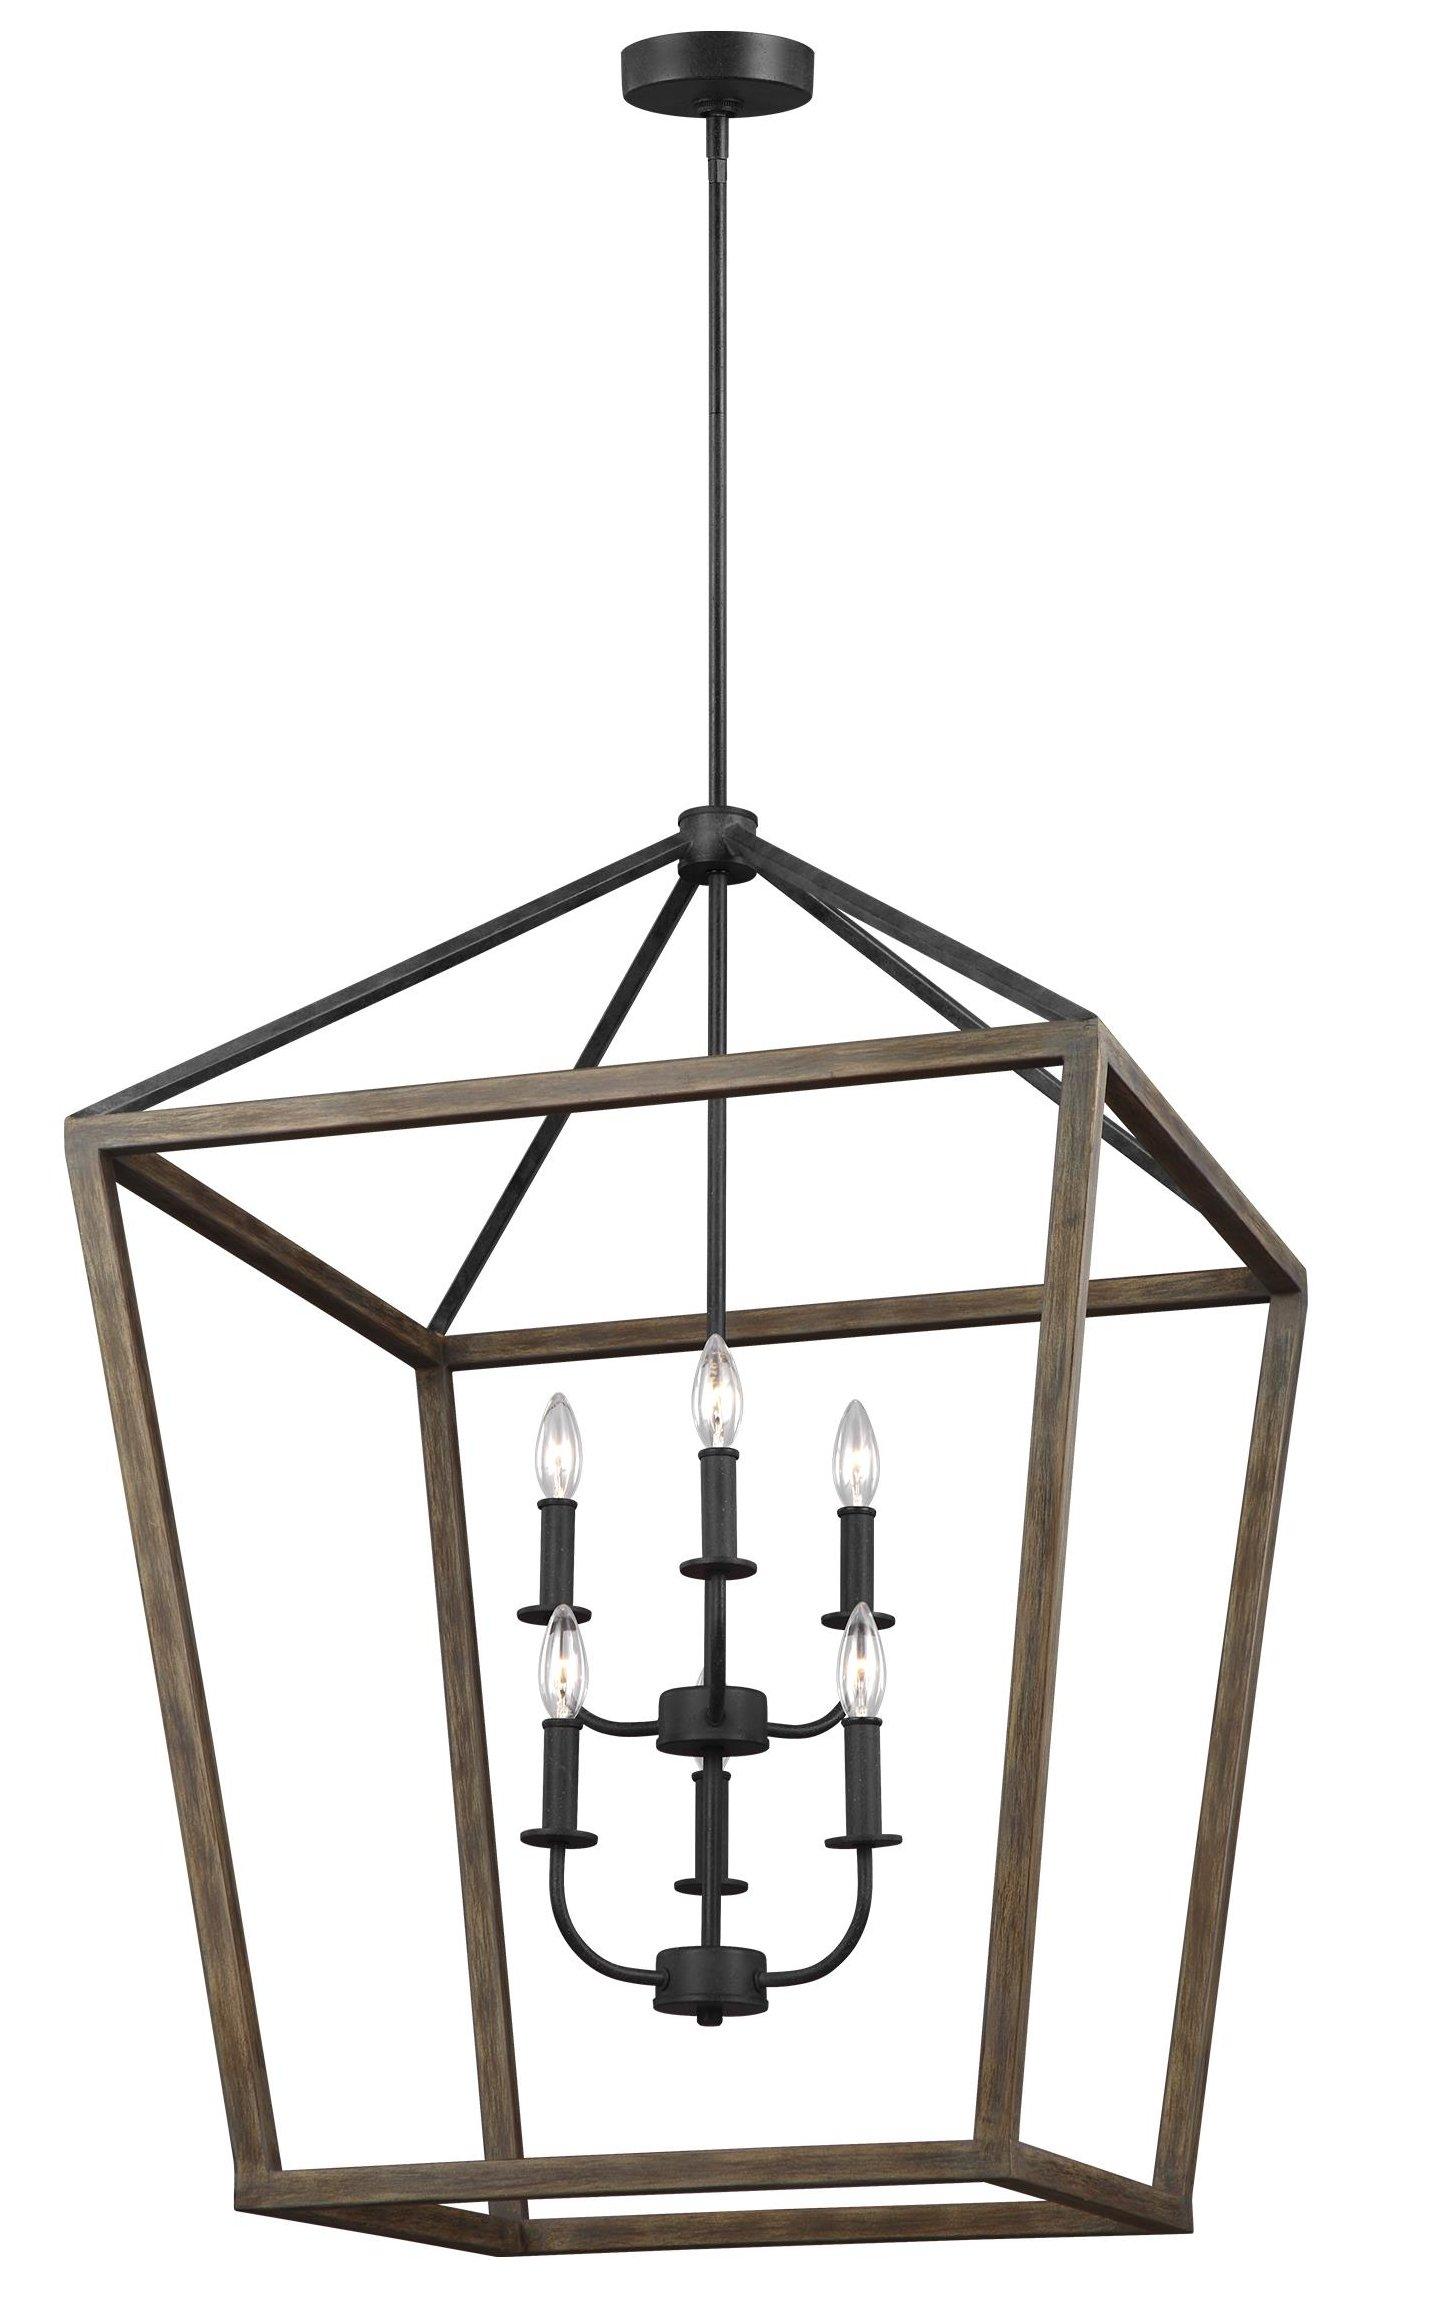 Natarsha 6-Light Lantern Geometric Pendant pertaining to Odie 4-Light Lantern Square Pendants (Image 15 of 30)